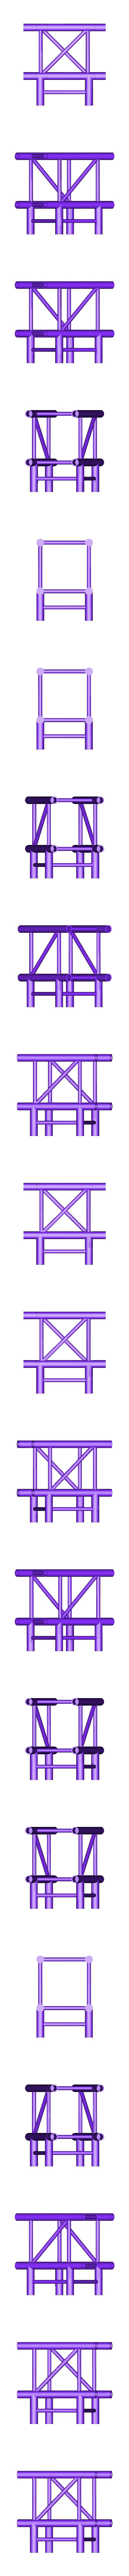 Truss 4 Punkt Traverse GWK022 3-Weg Ecke (x4).stl Download STL file 1:18 Truss 4 Punkt Traverse Messestand ZSB1000 • Template to 3D print, CrossModellbau